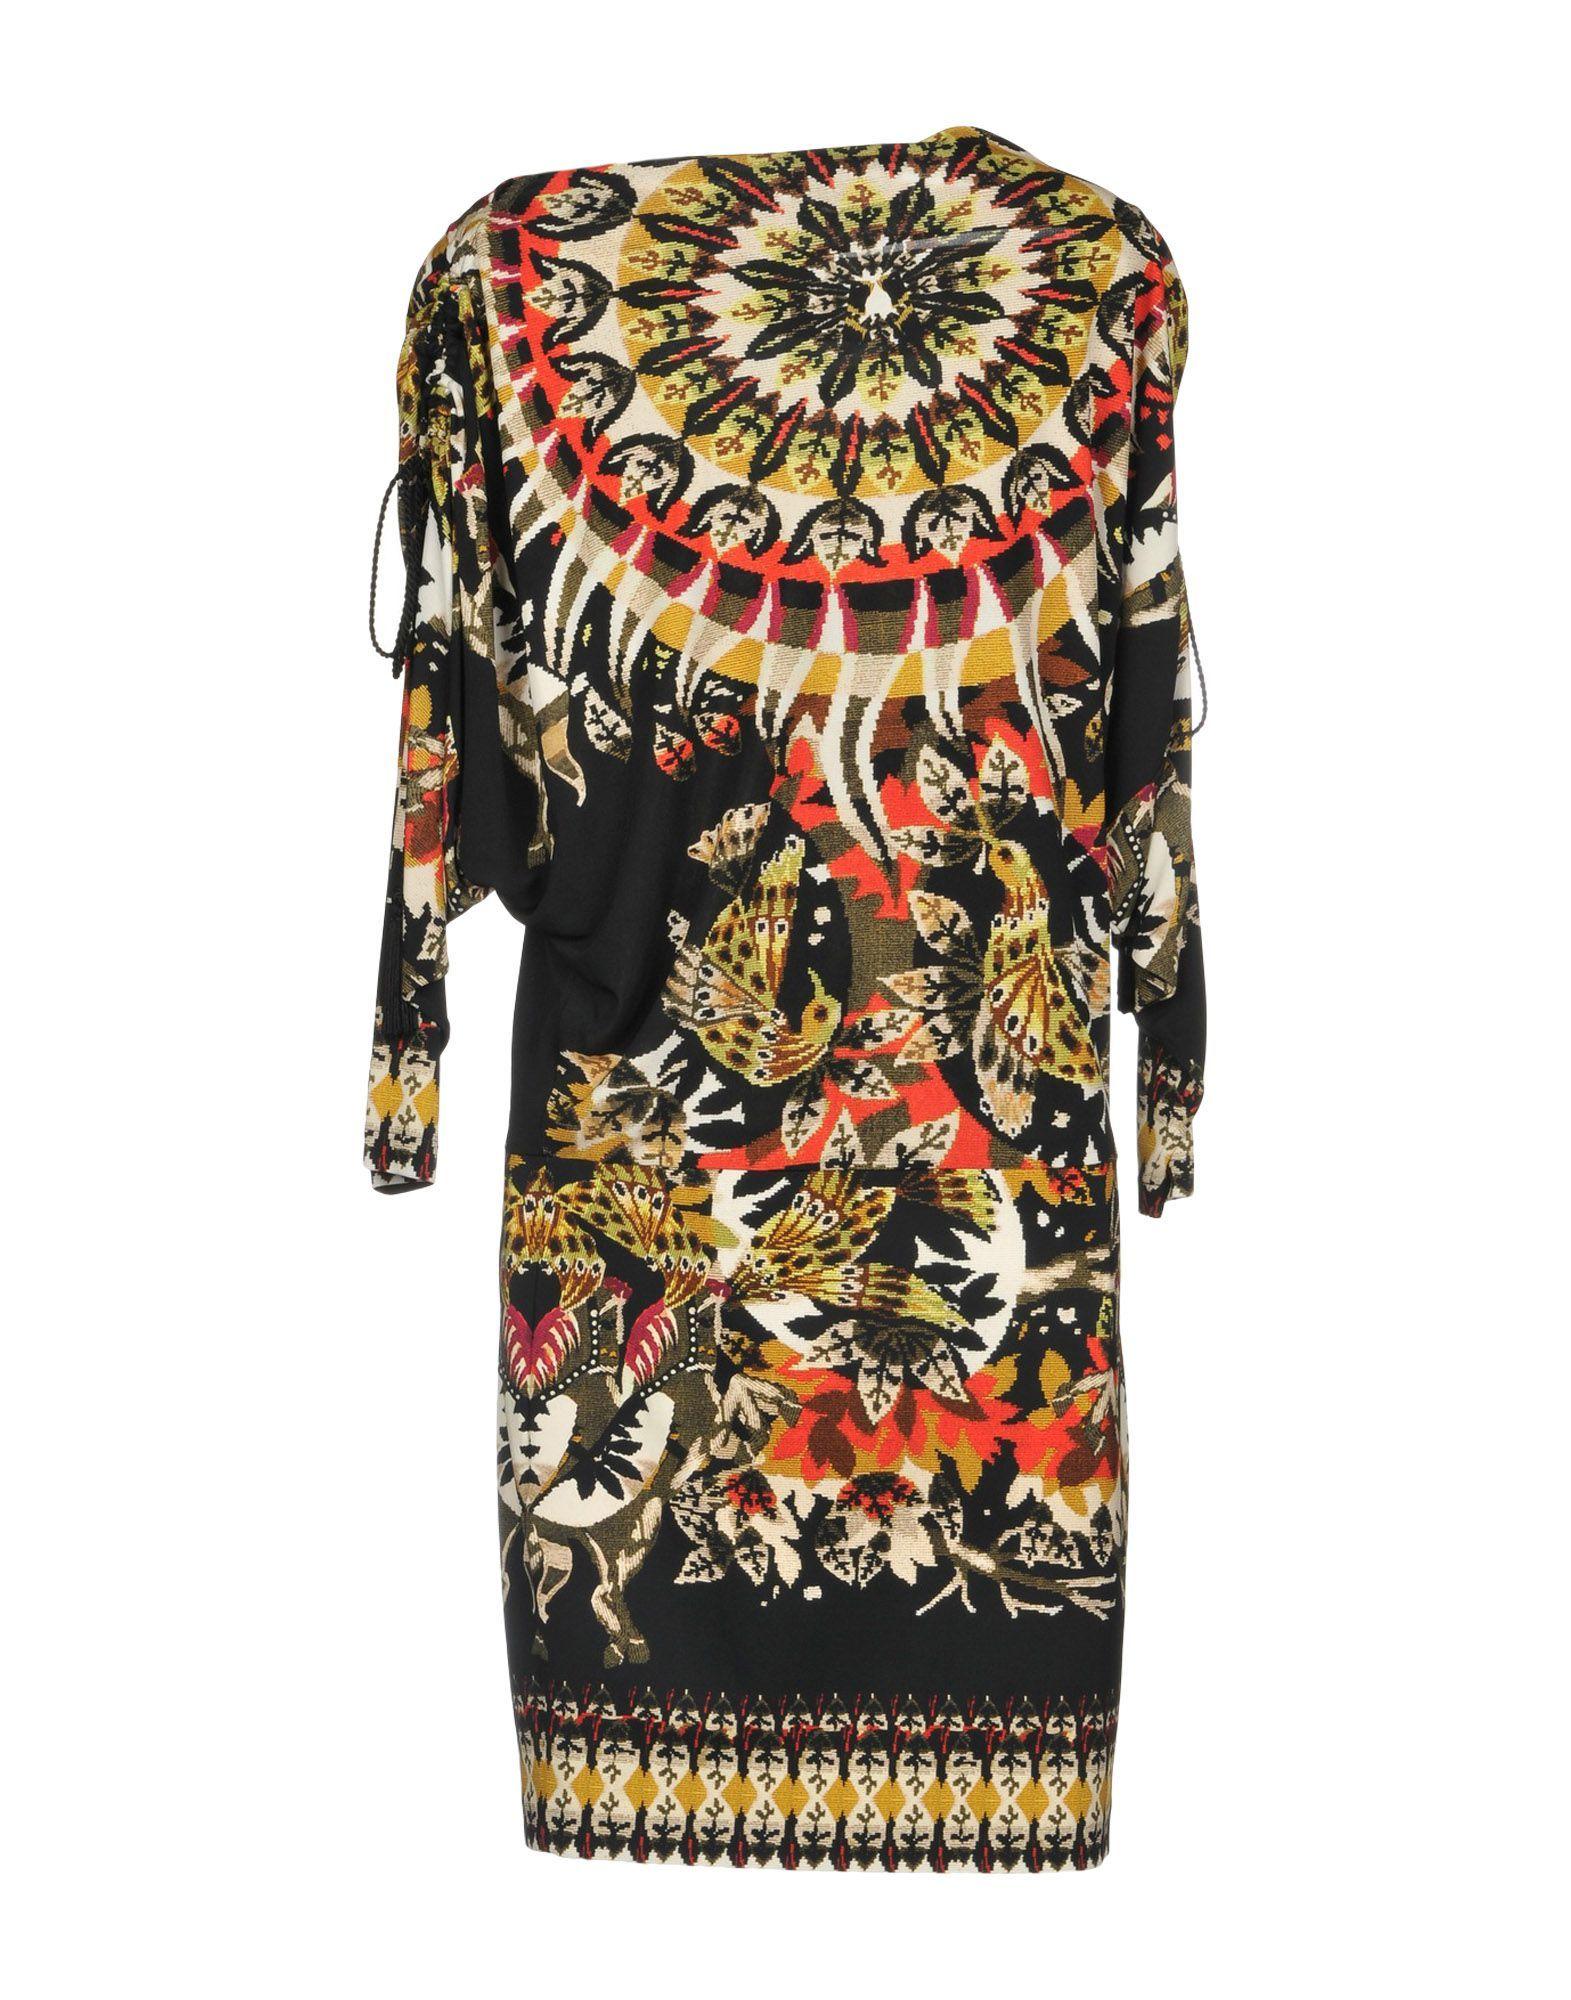 Roberto Cavalli Black Print Long Sleeve Dress